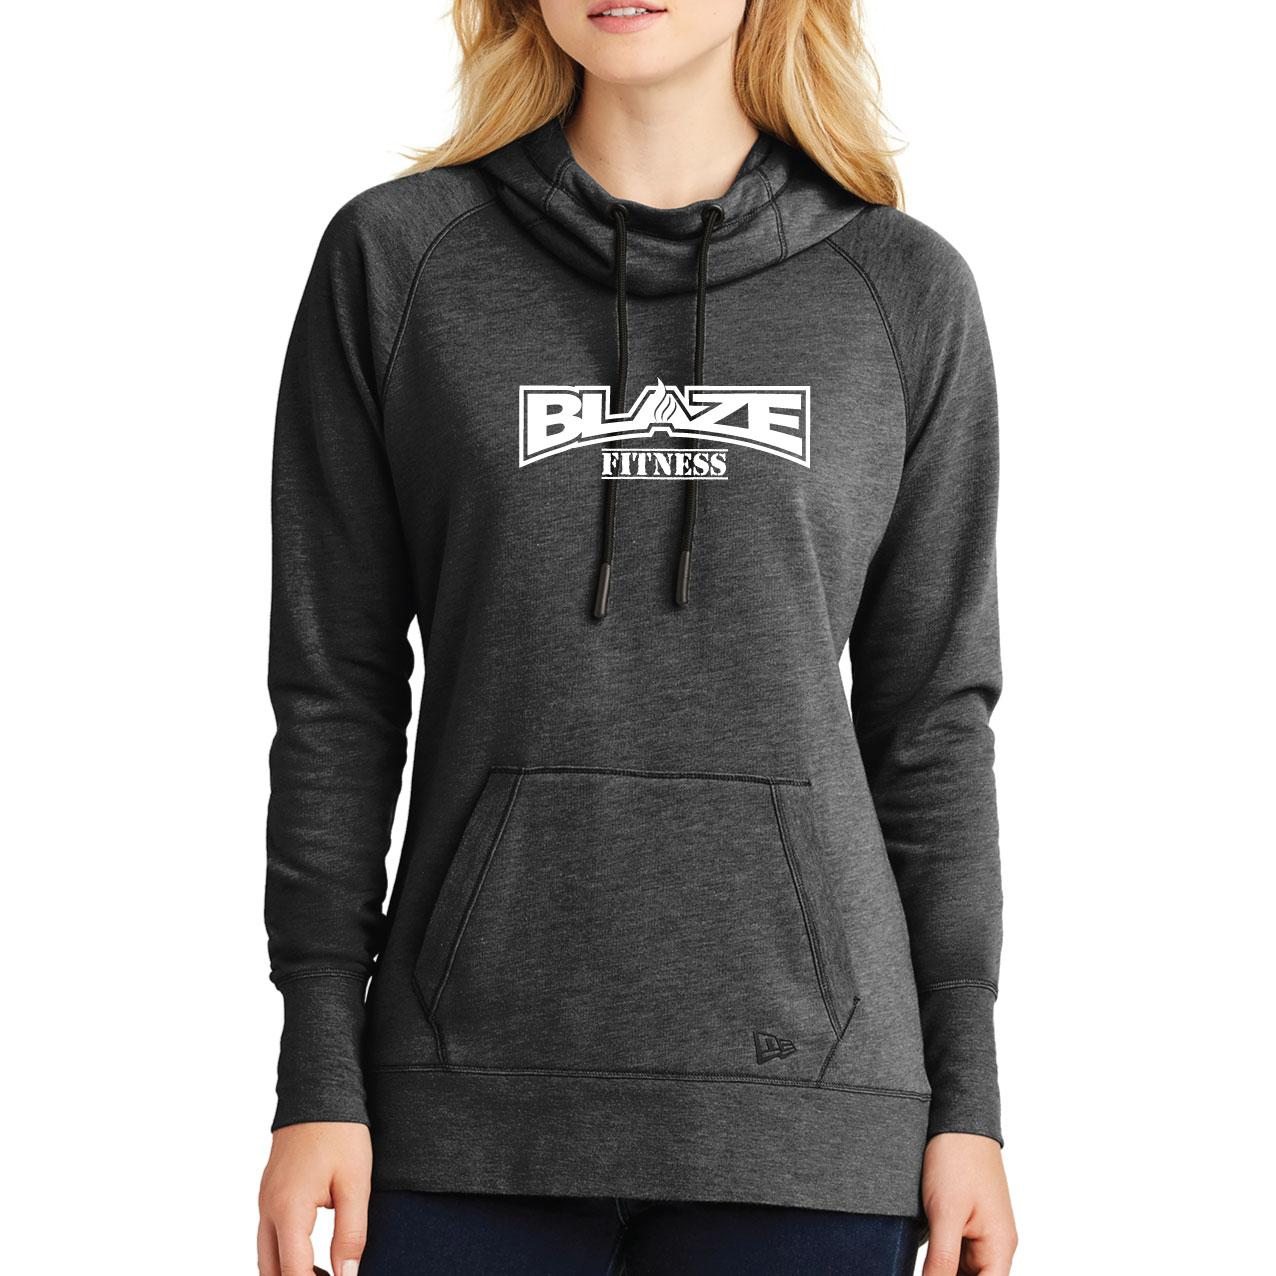 841ea2b69 Blaze Fitness Ladies Tri-Blend Fleece Pullover Hoodie – Black Heather